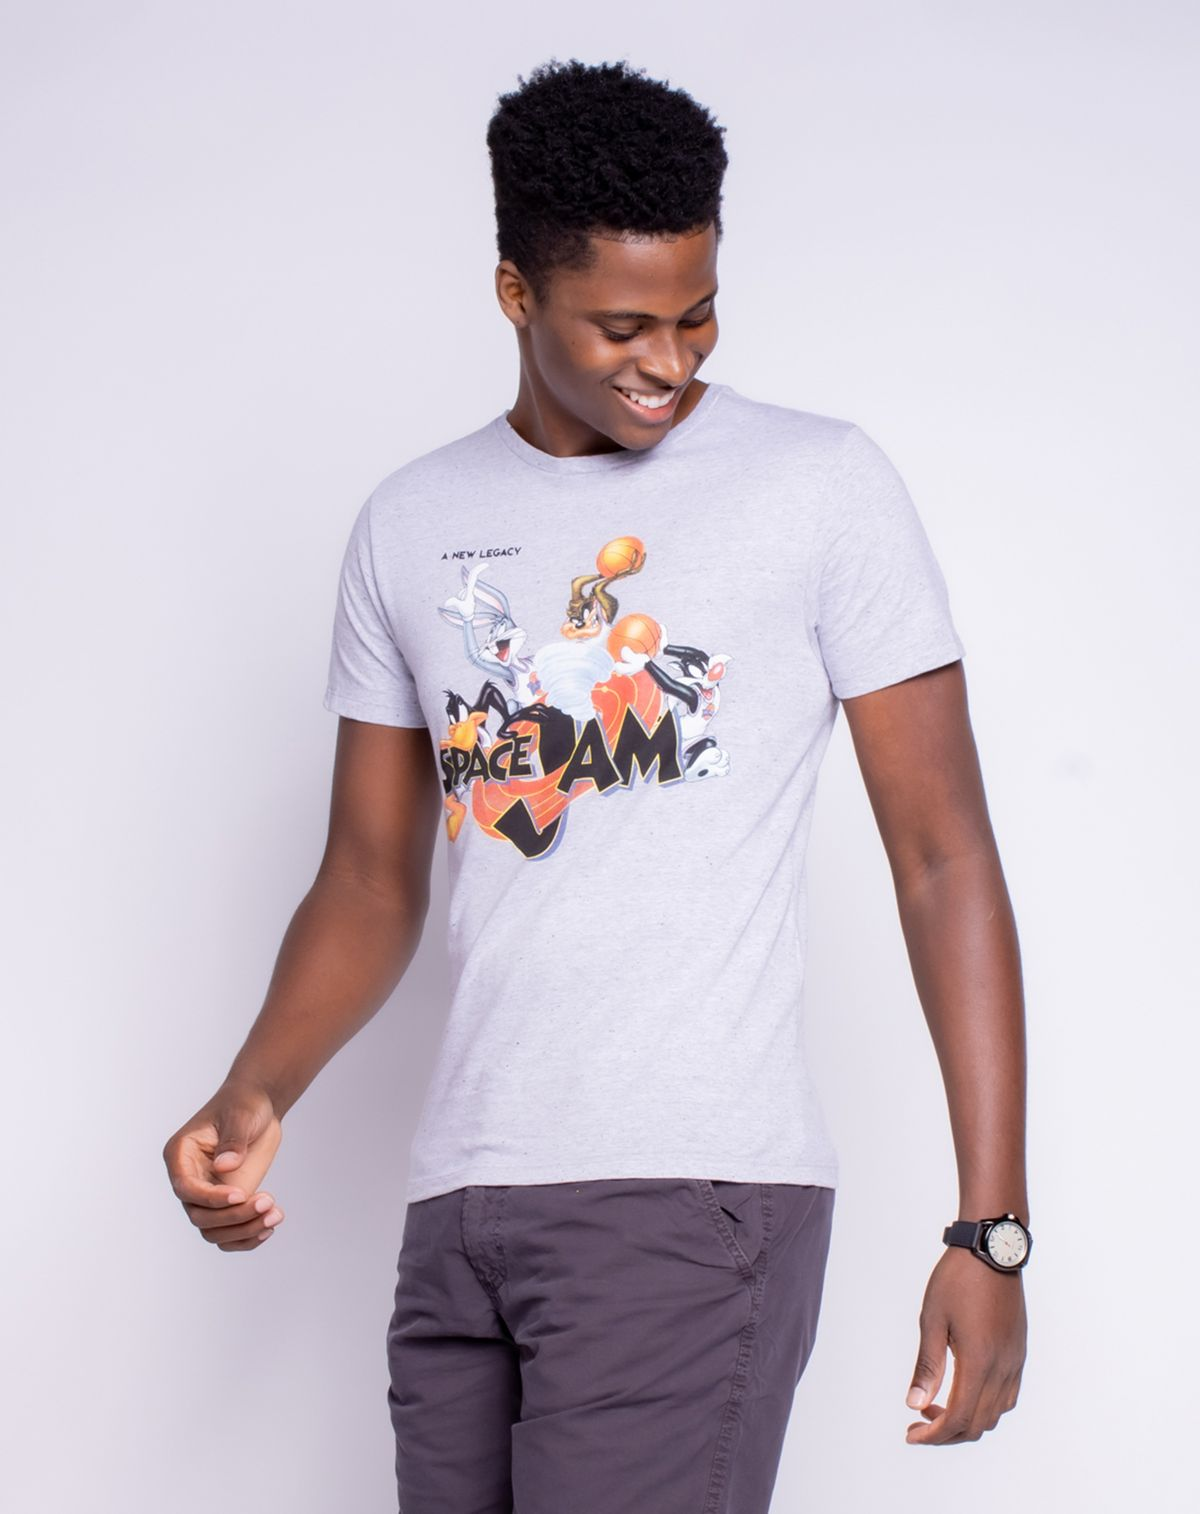 592645012-camiseta-manga-curta-masculina-botone-space-jam-mescla-gg-5dd